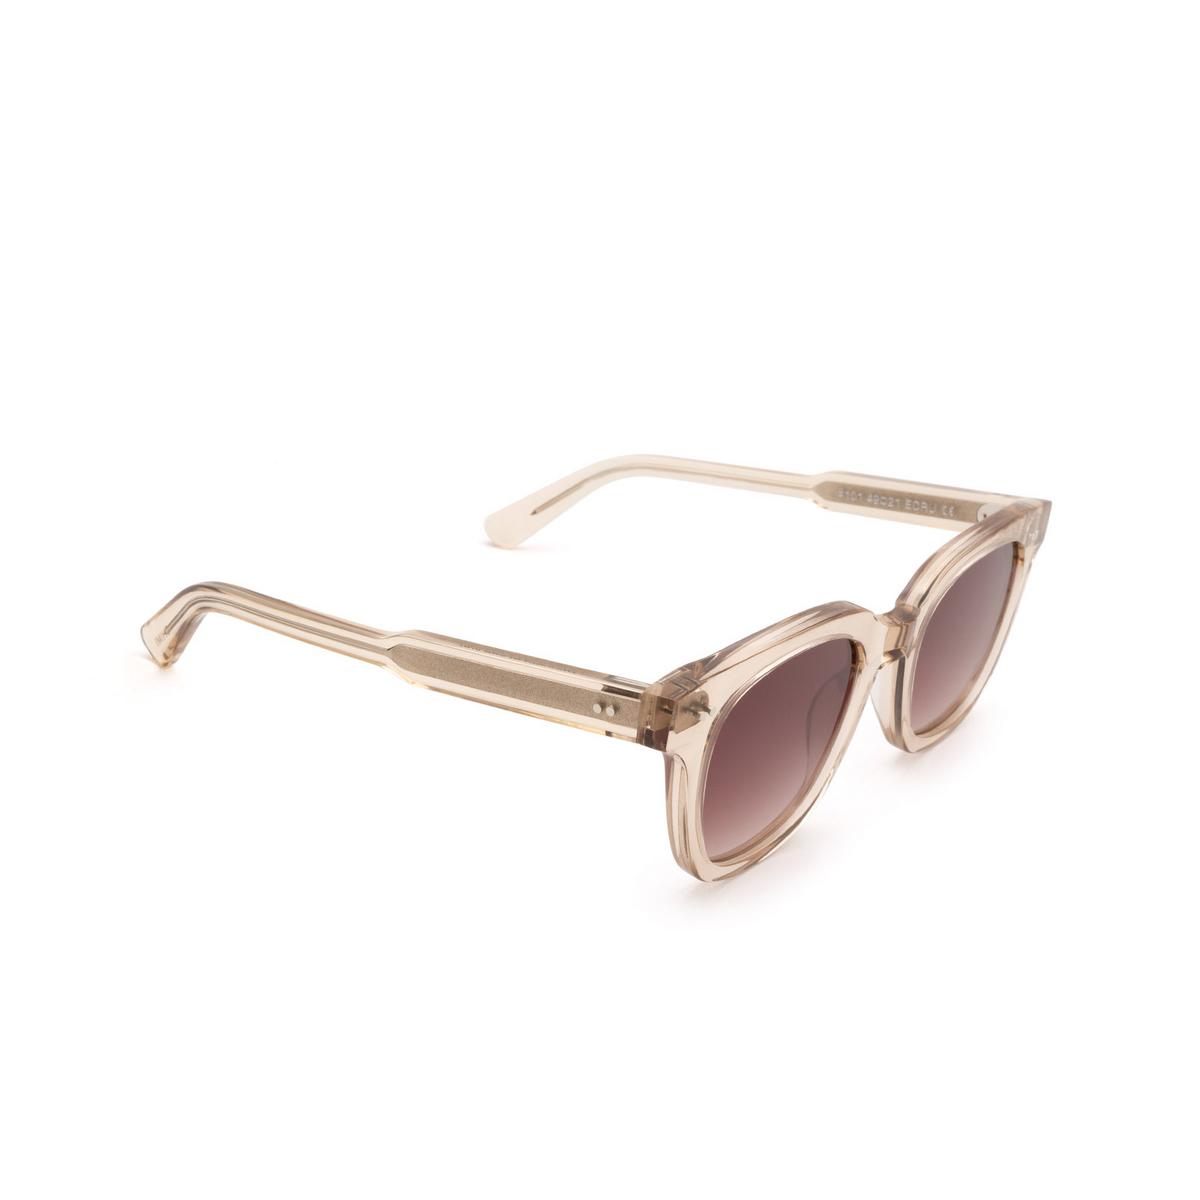 Chimi® Square Sunglasses: #101 color Light Beige Ecru - three-quarters view.